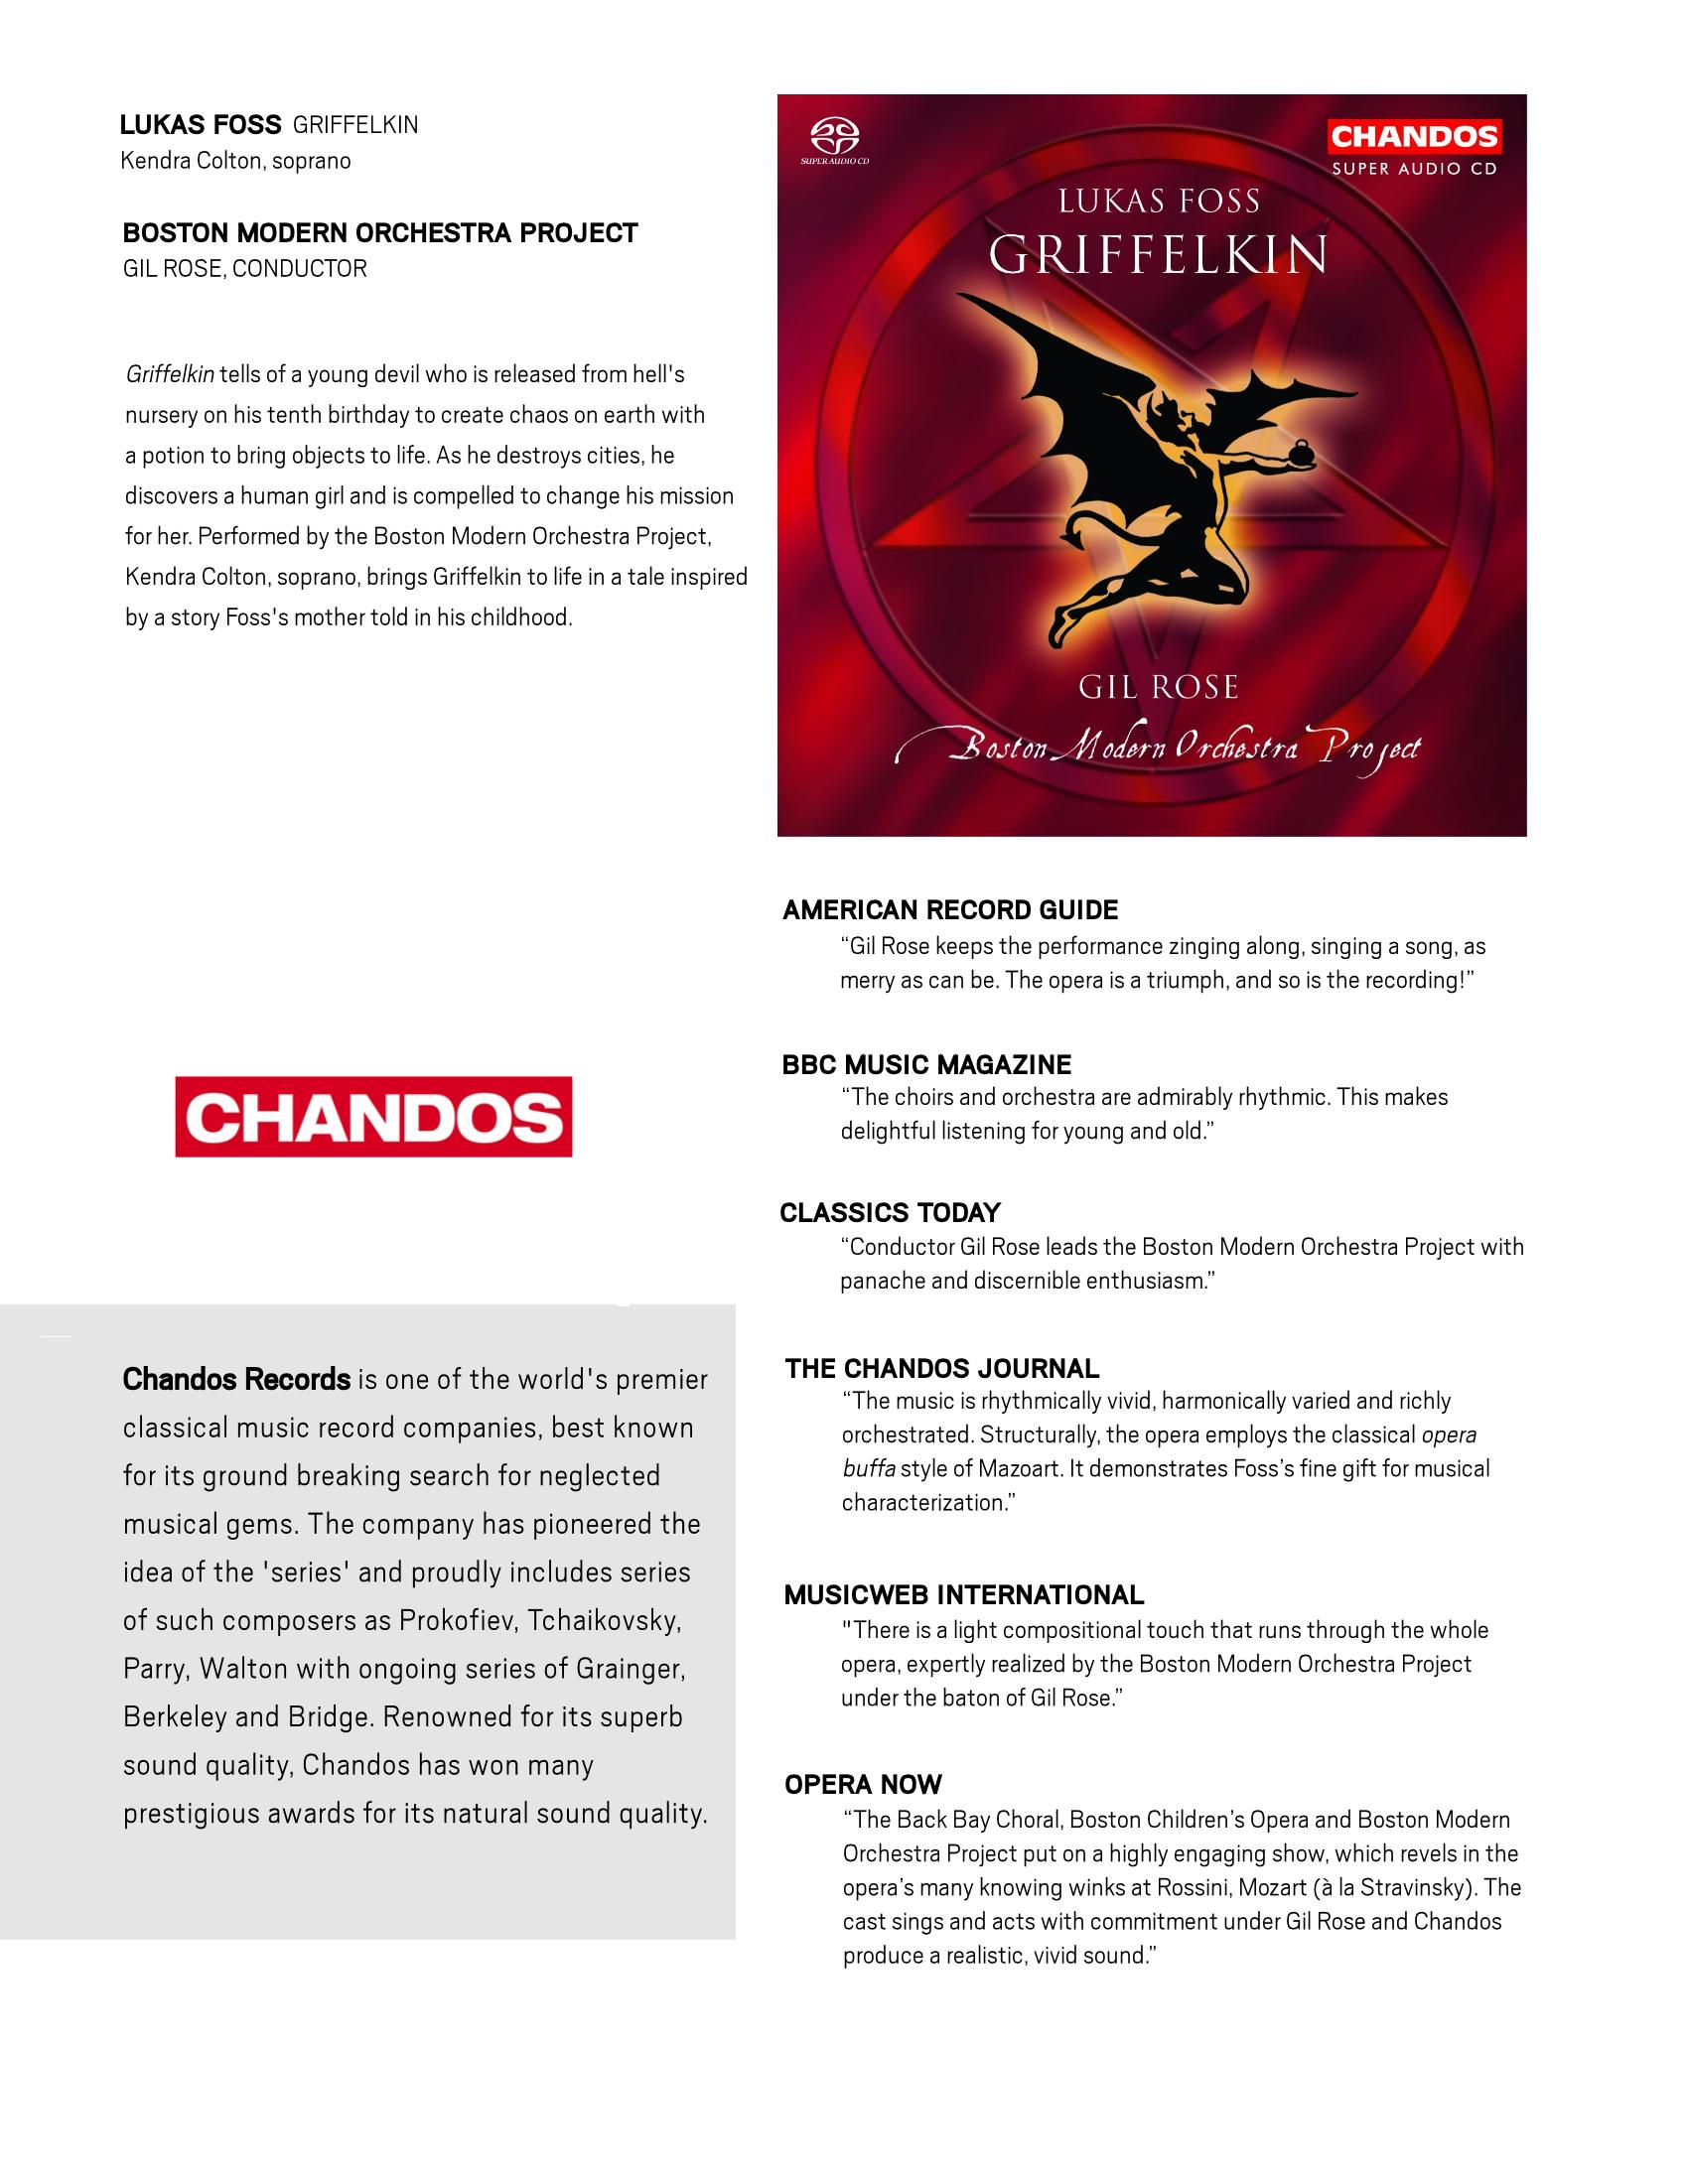 Foss - Chandos 10067 one-sheet.png